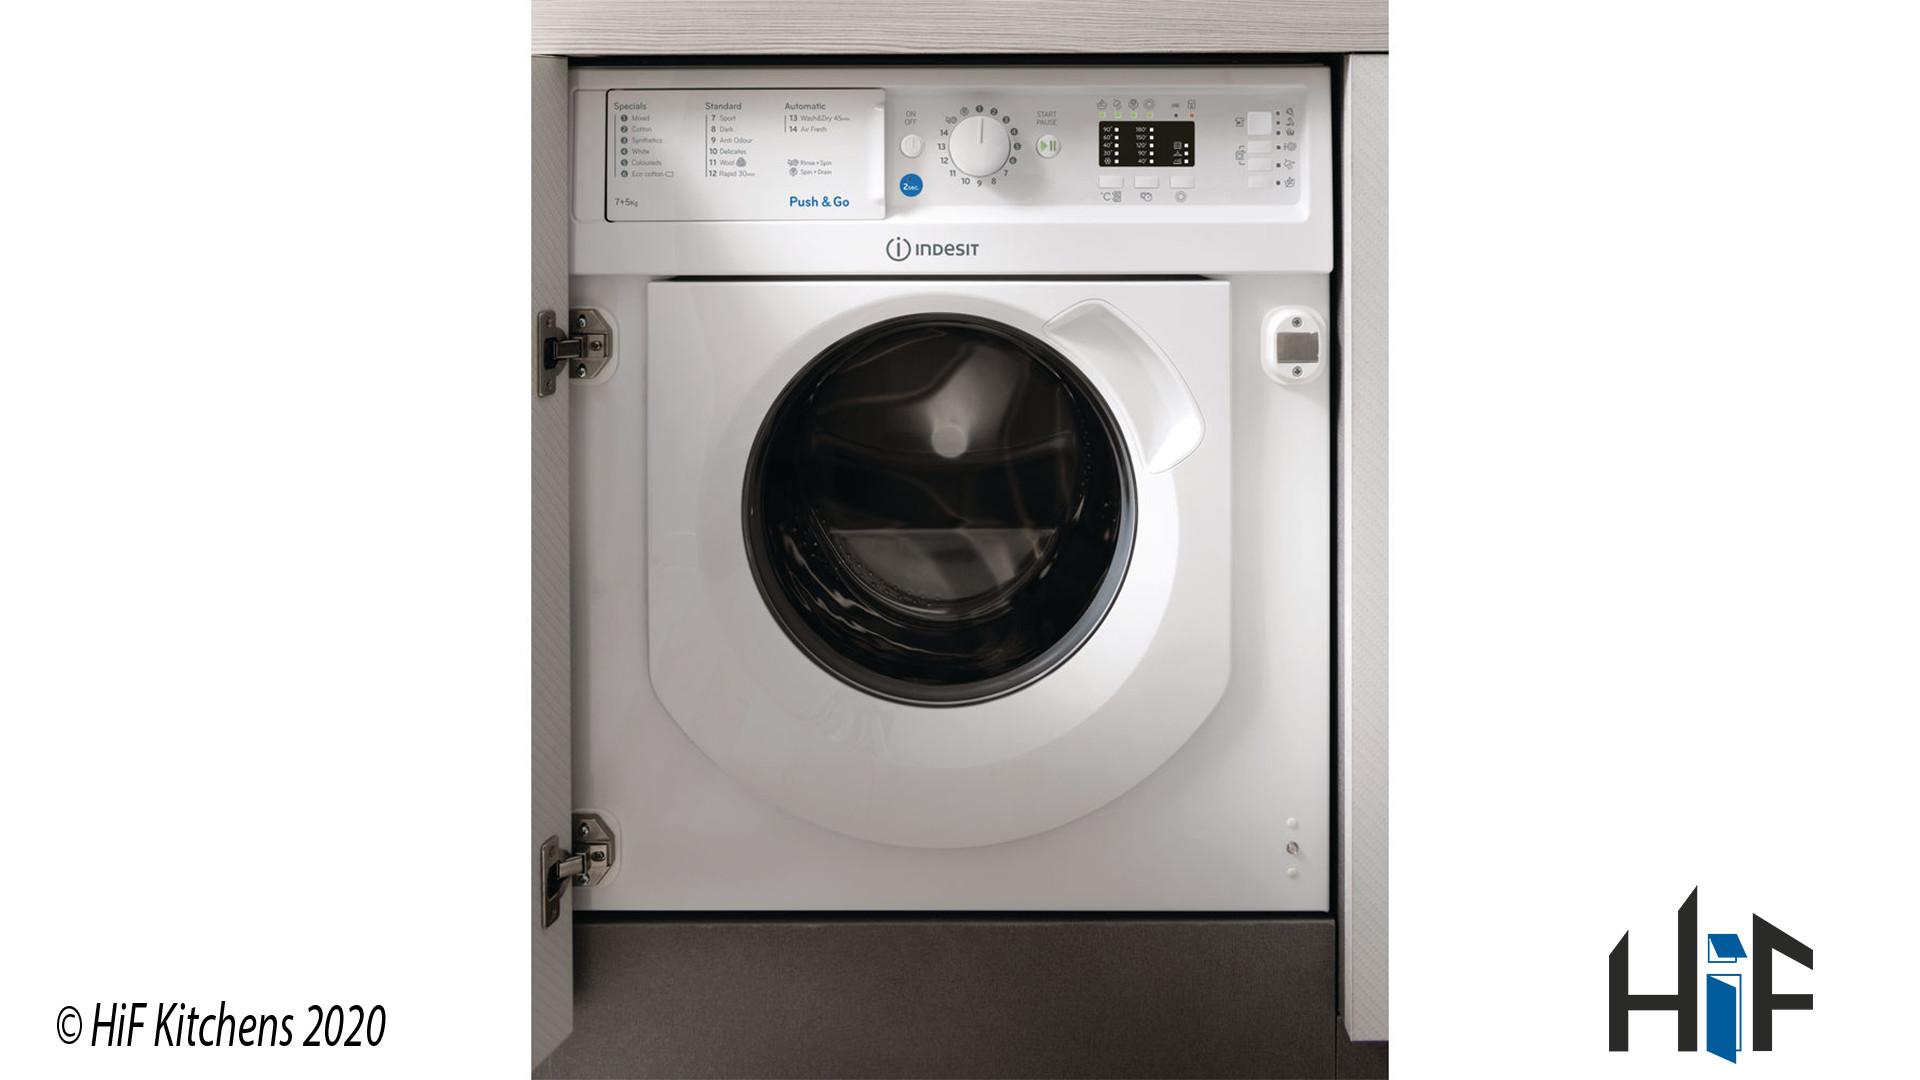 Indesit Ecotime BI WDIL 7125 UK Integrated Washer Dryer